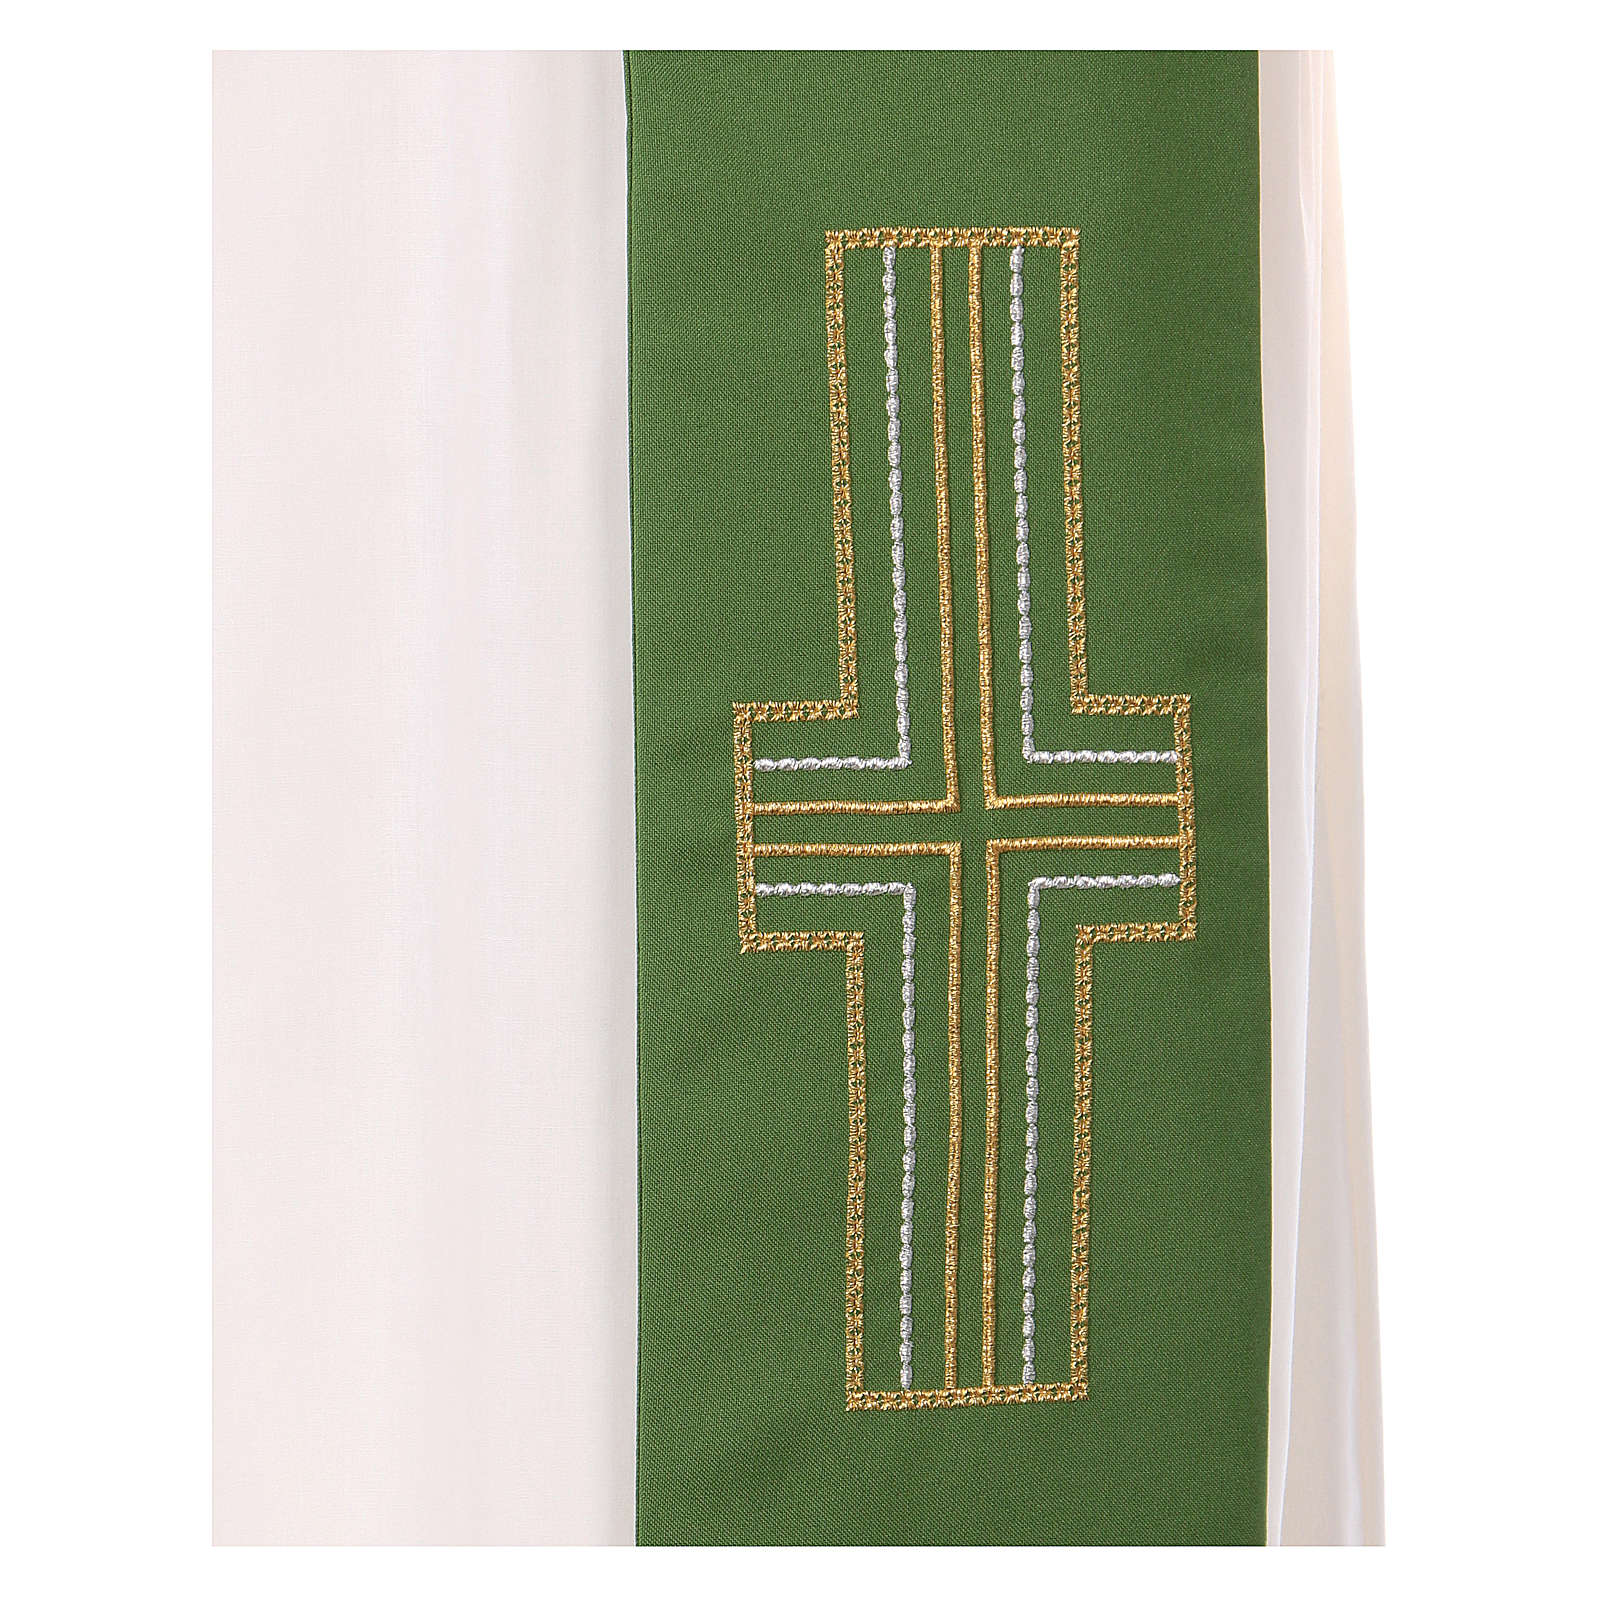 Stola diaconale 100% poliestere ceri 4